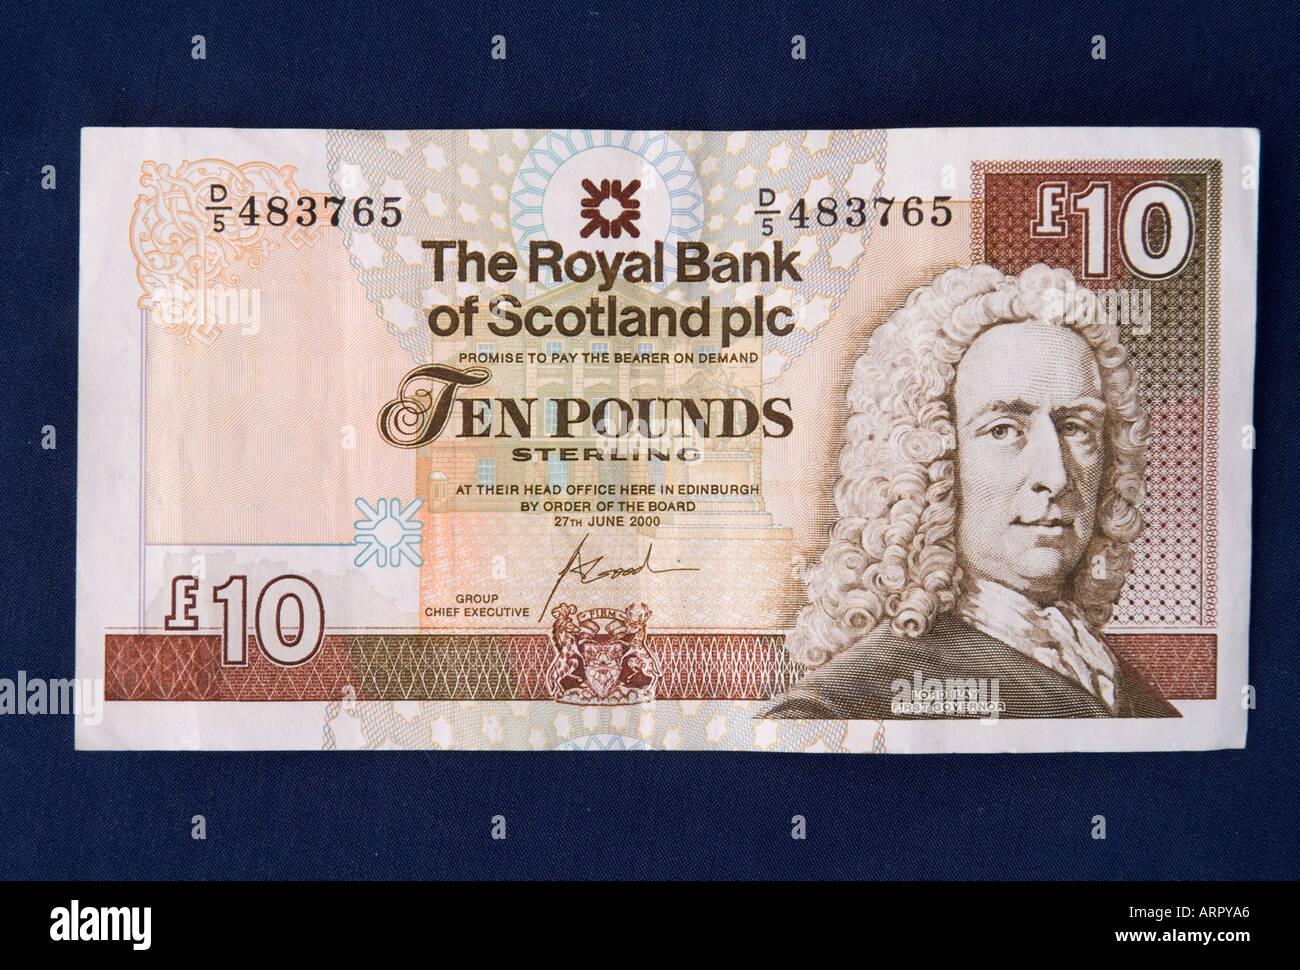 dh Scottish money ten pounds MONEY SCOTLAND UK Royal Bank of Scotland note RBS banknote 10 pound notes cut out cash Stock Photo